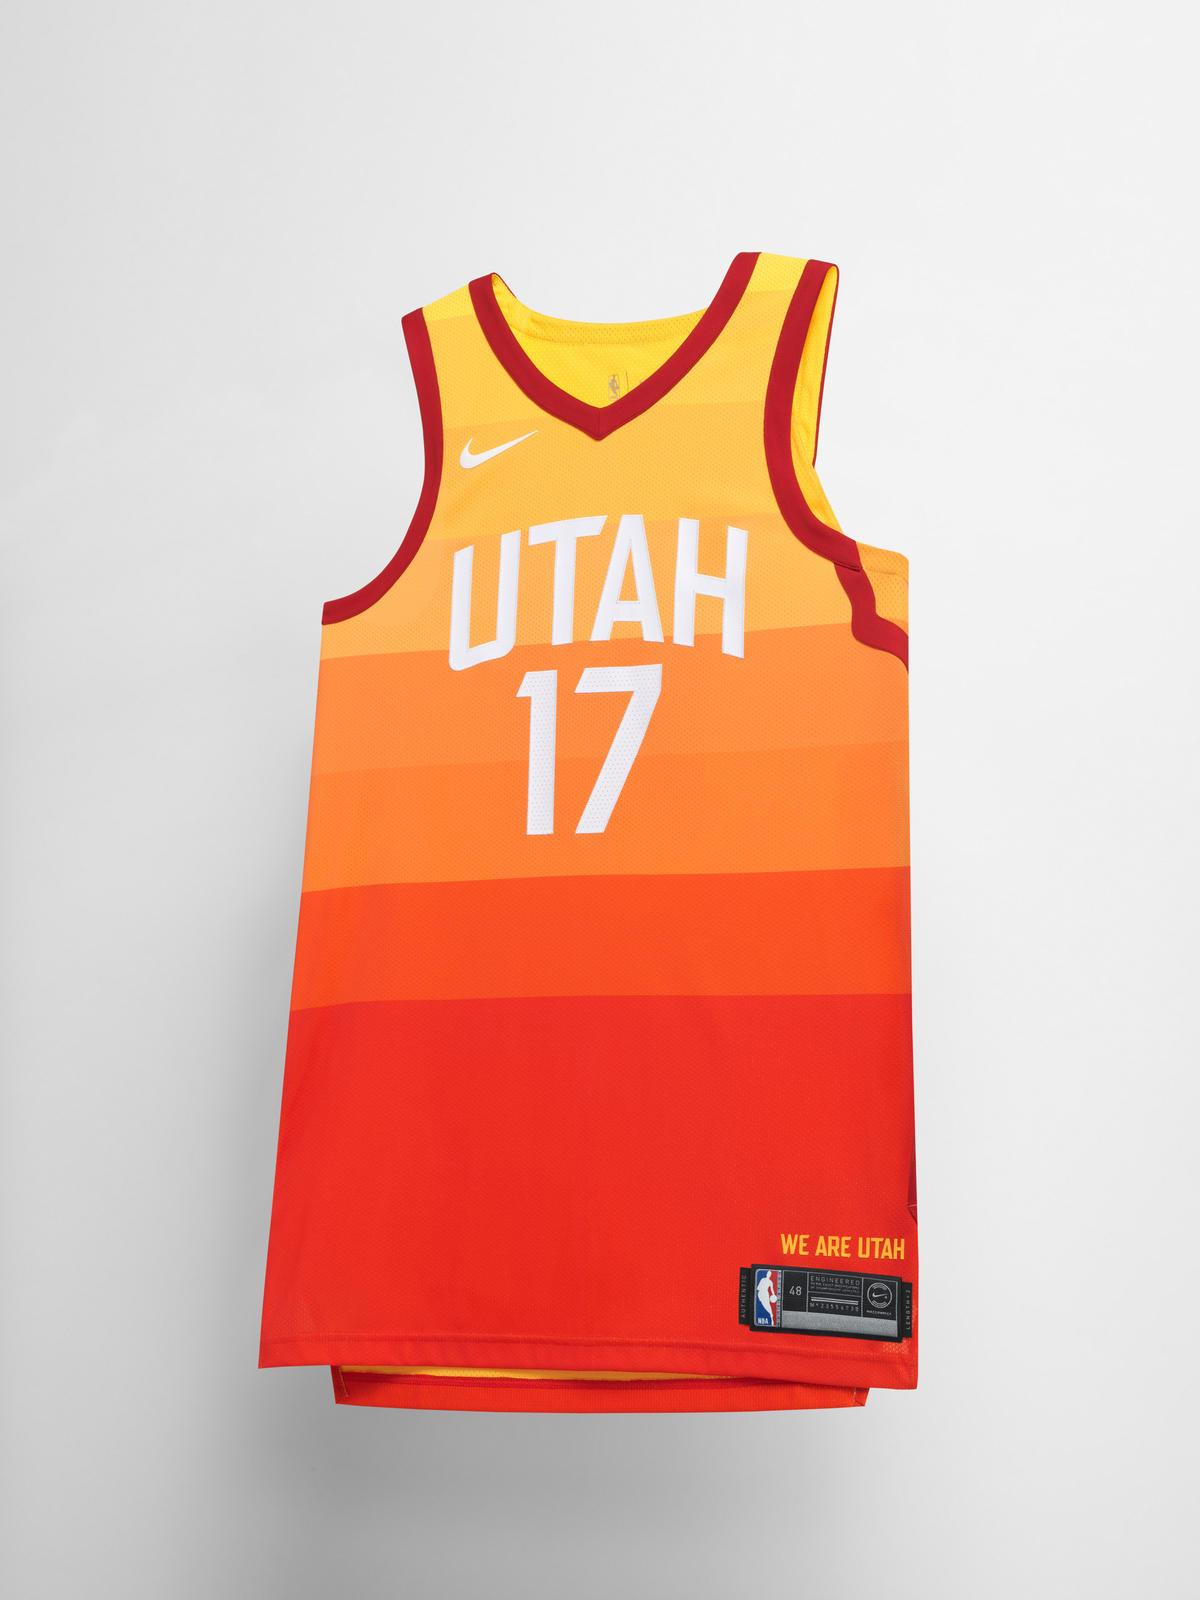 Nike_NBA_City_Edition_Uniform_Utah_Jazz_0209_native_1600